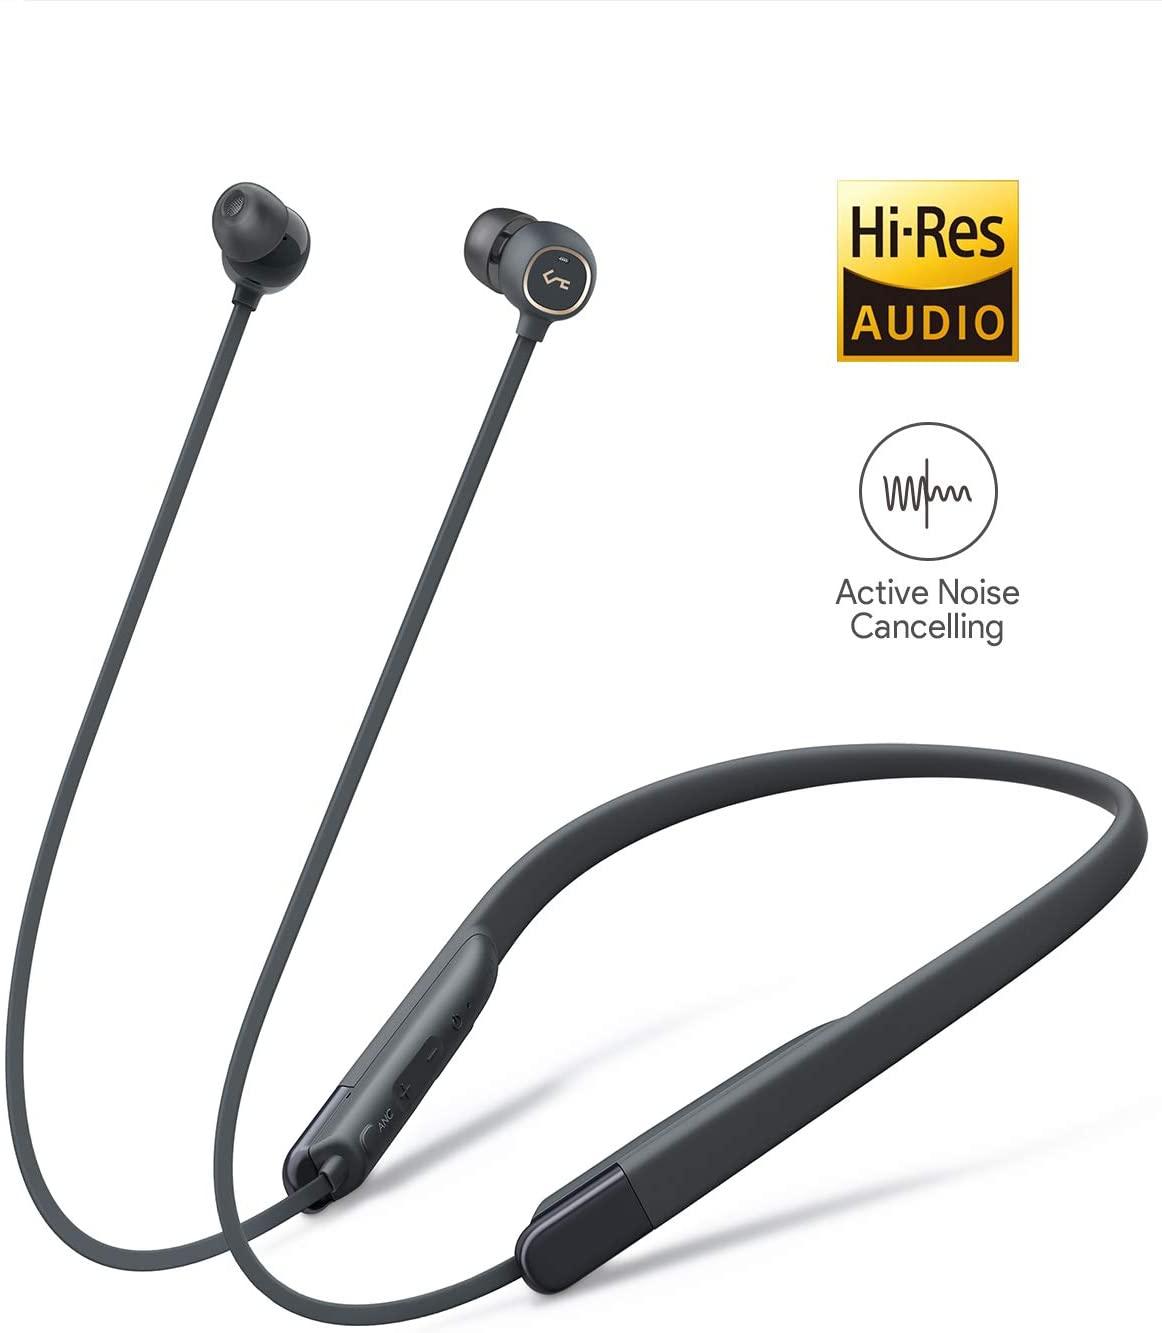 Aukey Key Series EP-N33 Wireless Bluetooth Headphones Review